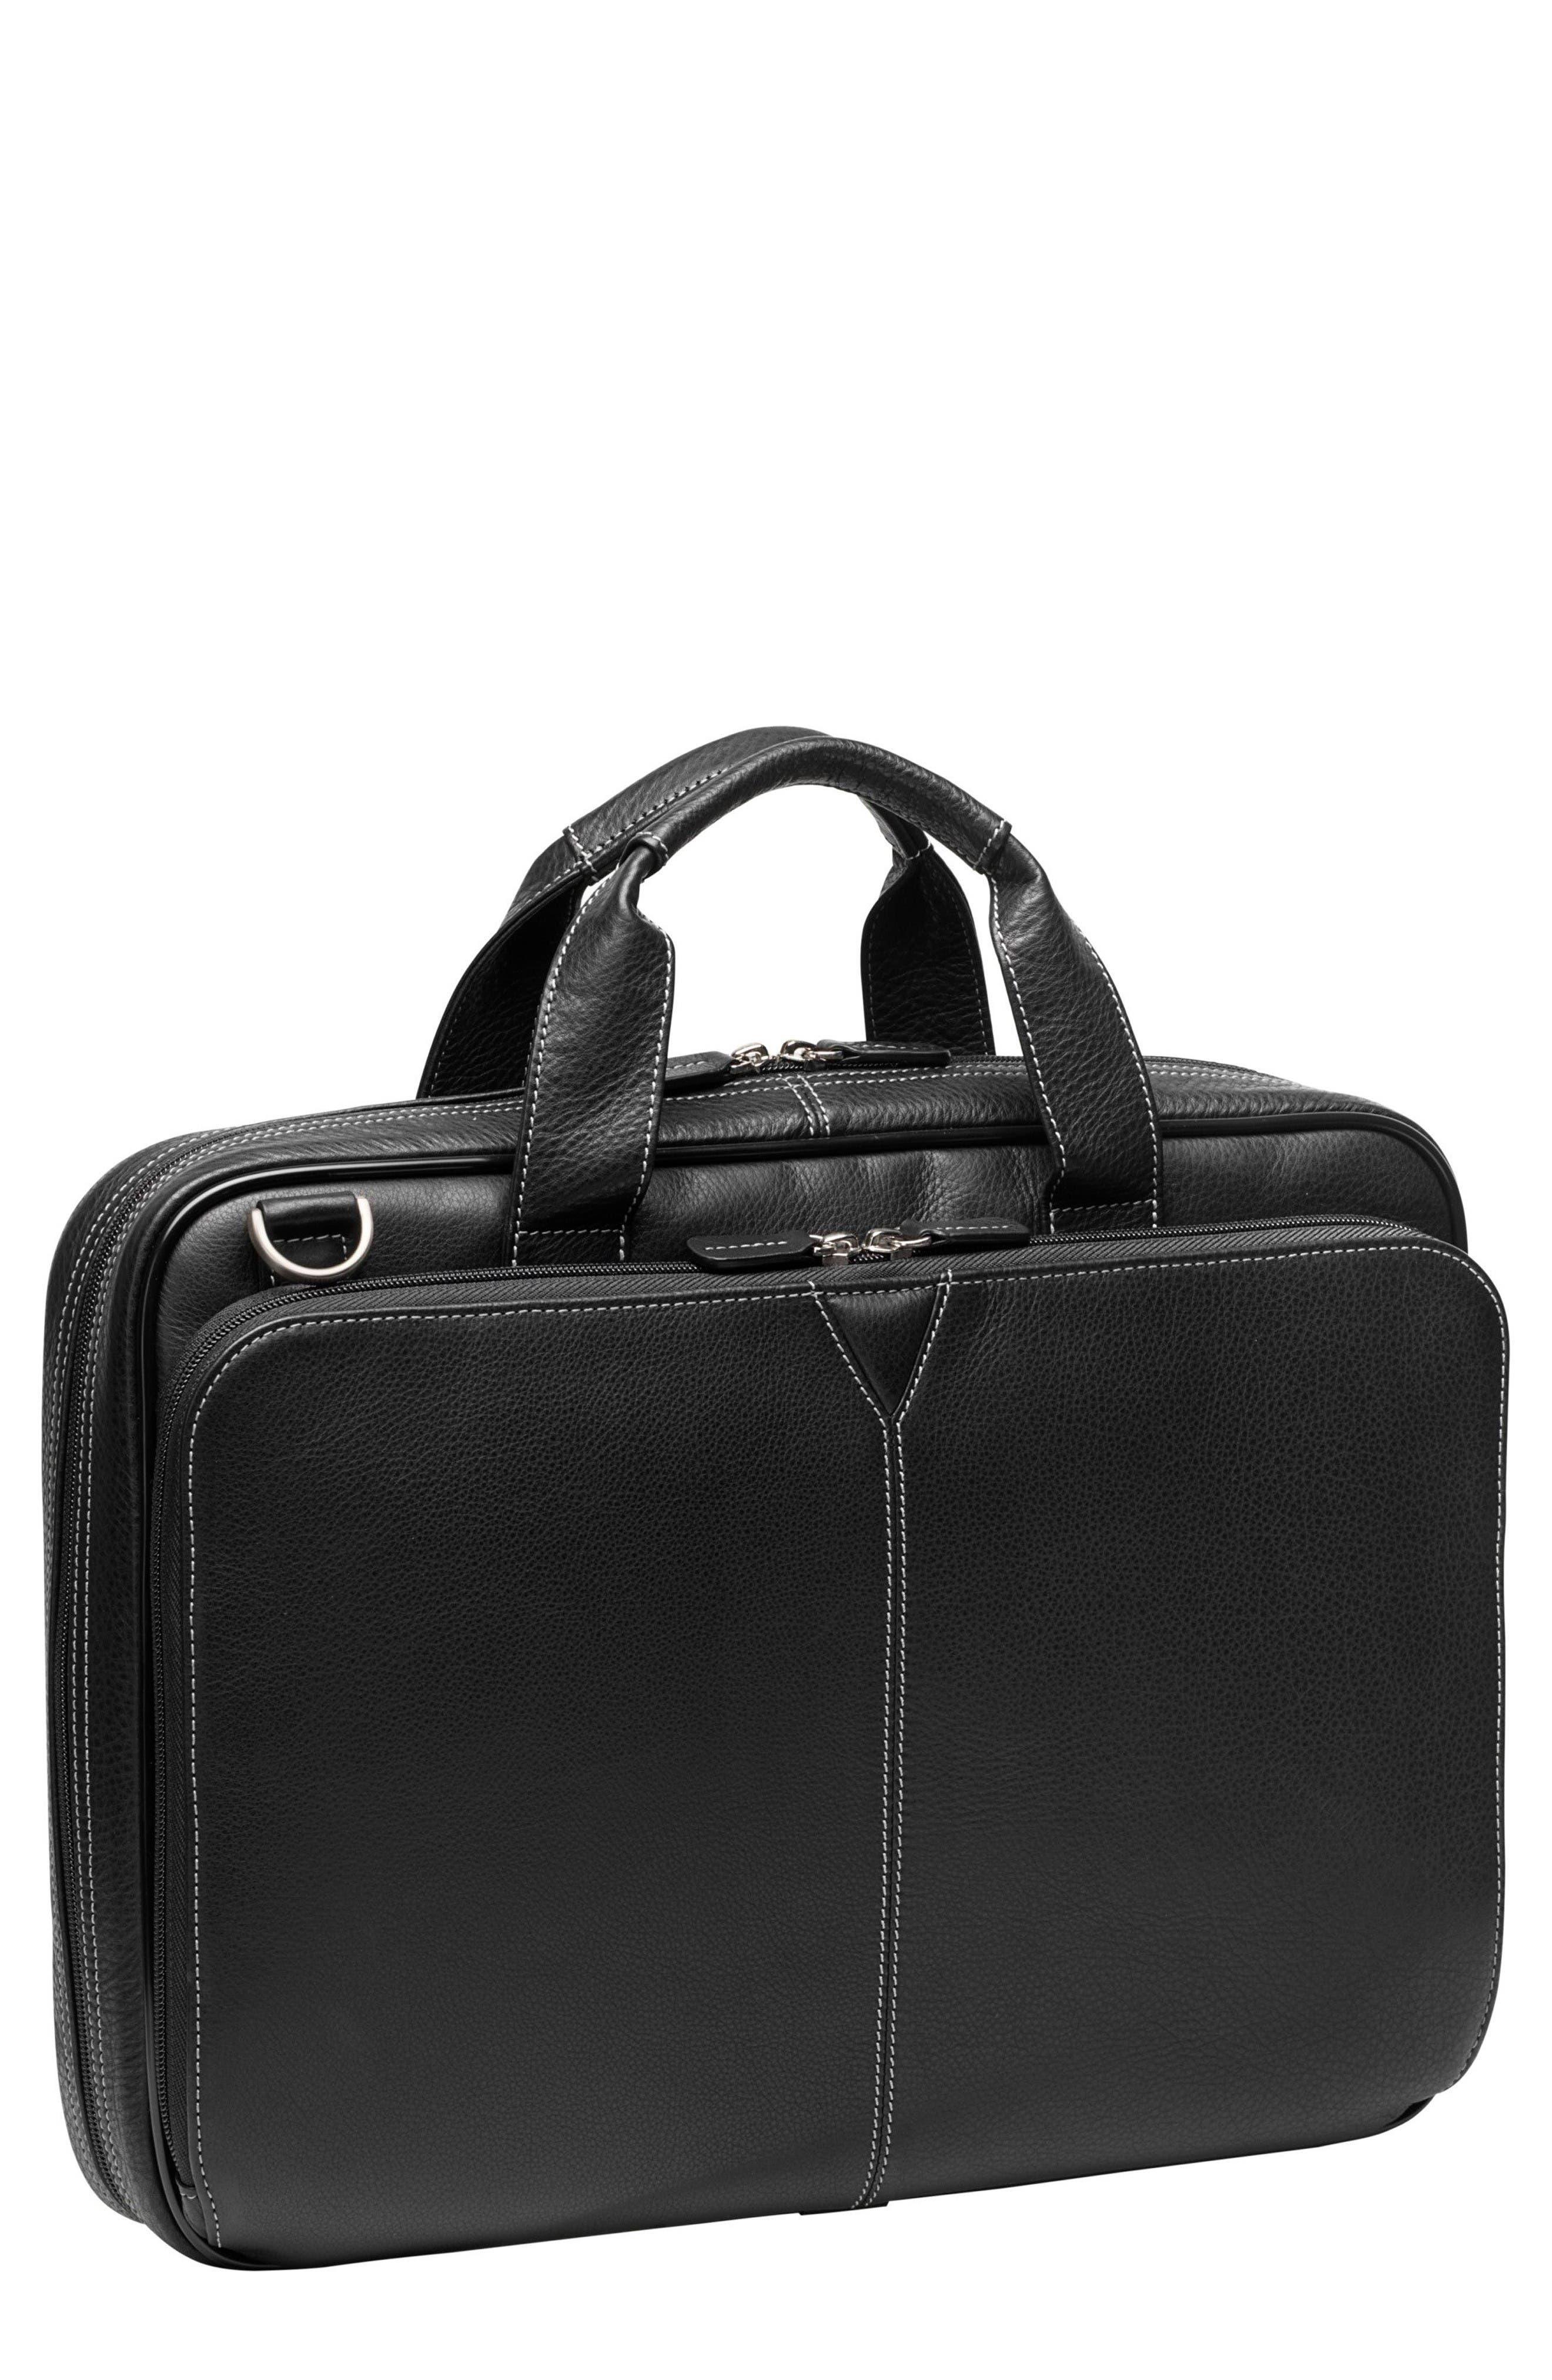 Johnston & Murphy Leather Briefcase